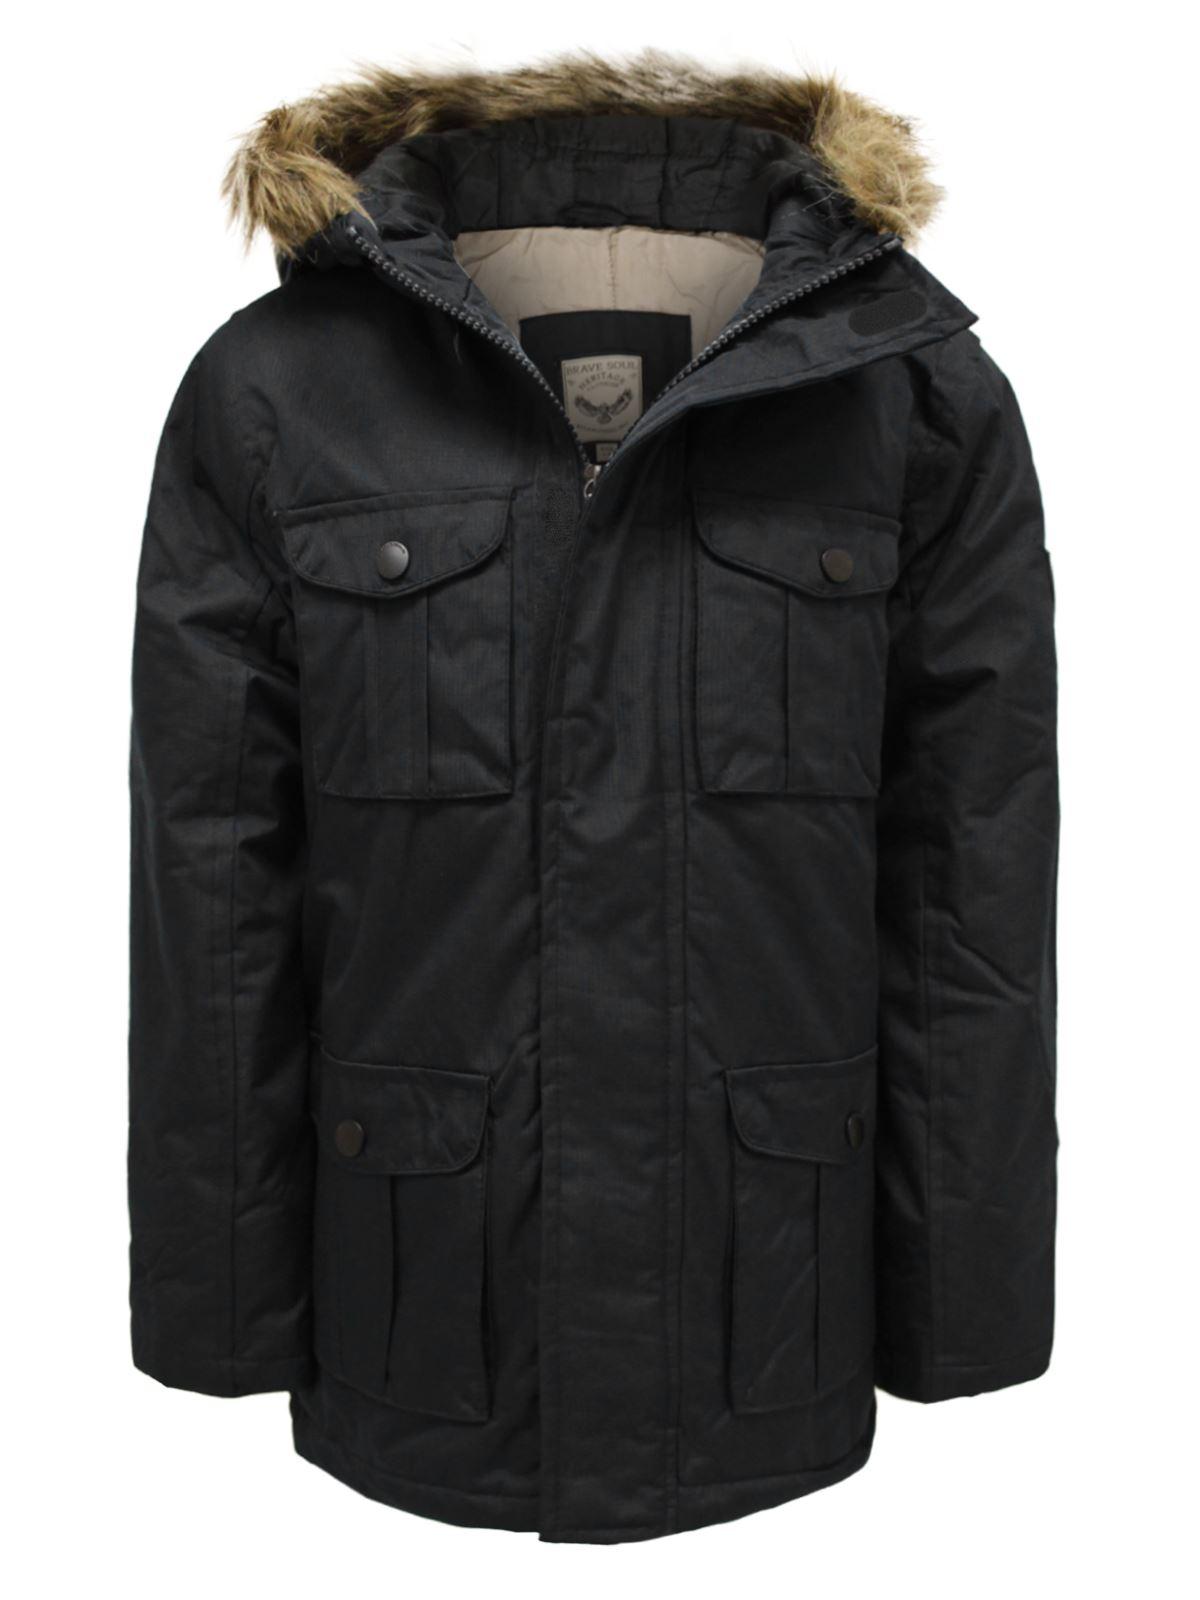 Boys Kids Back To School Parka Fur Hooded Padded Winter